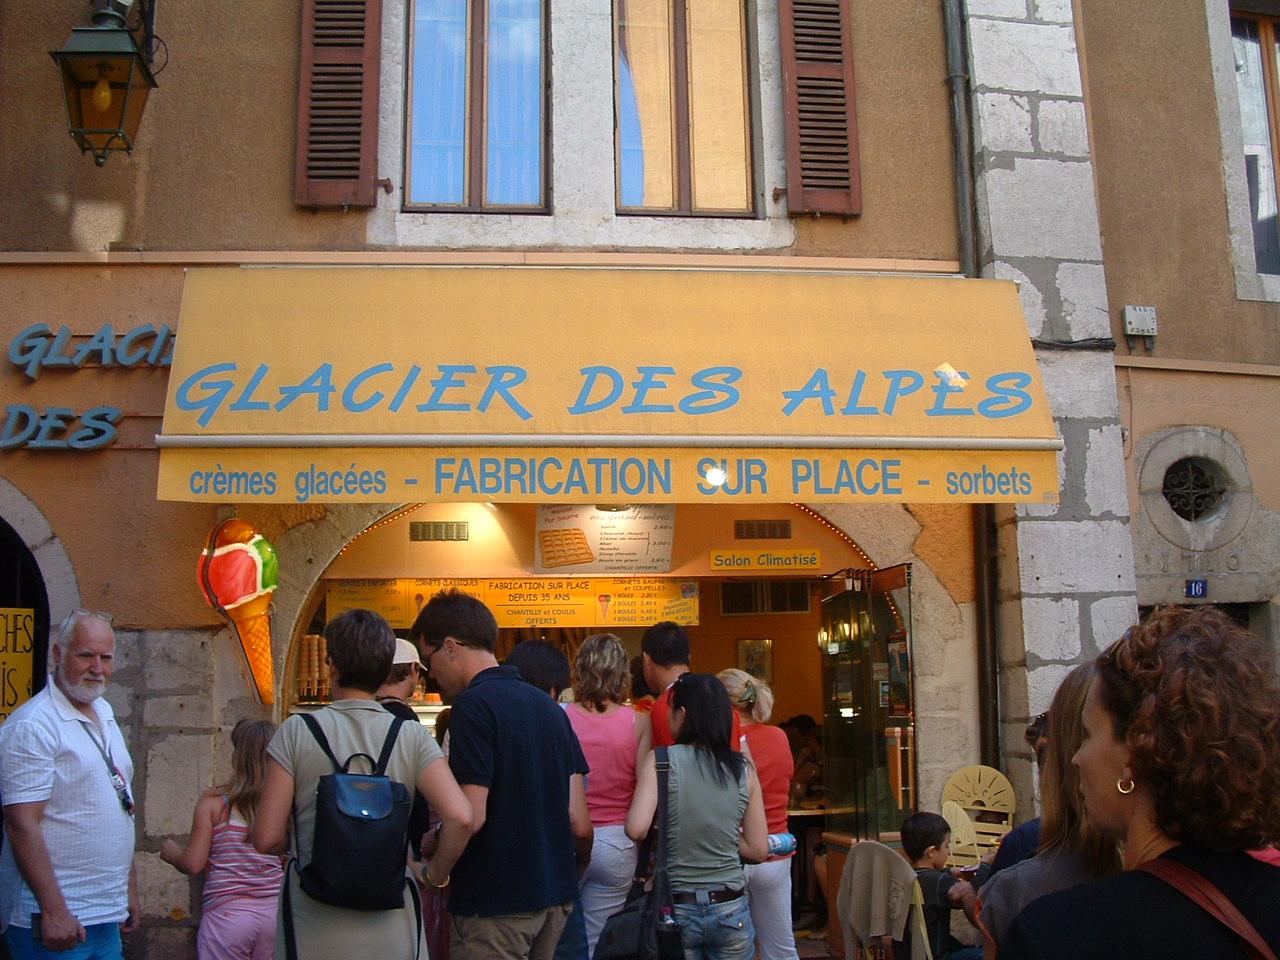 Glacier des Alpes Annecy